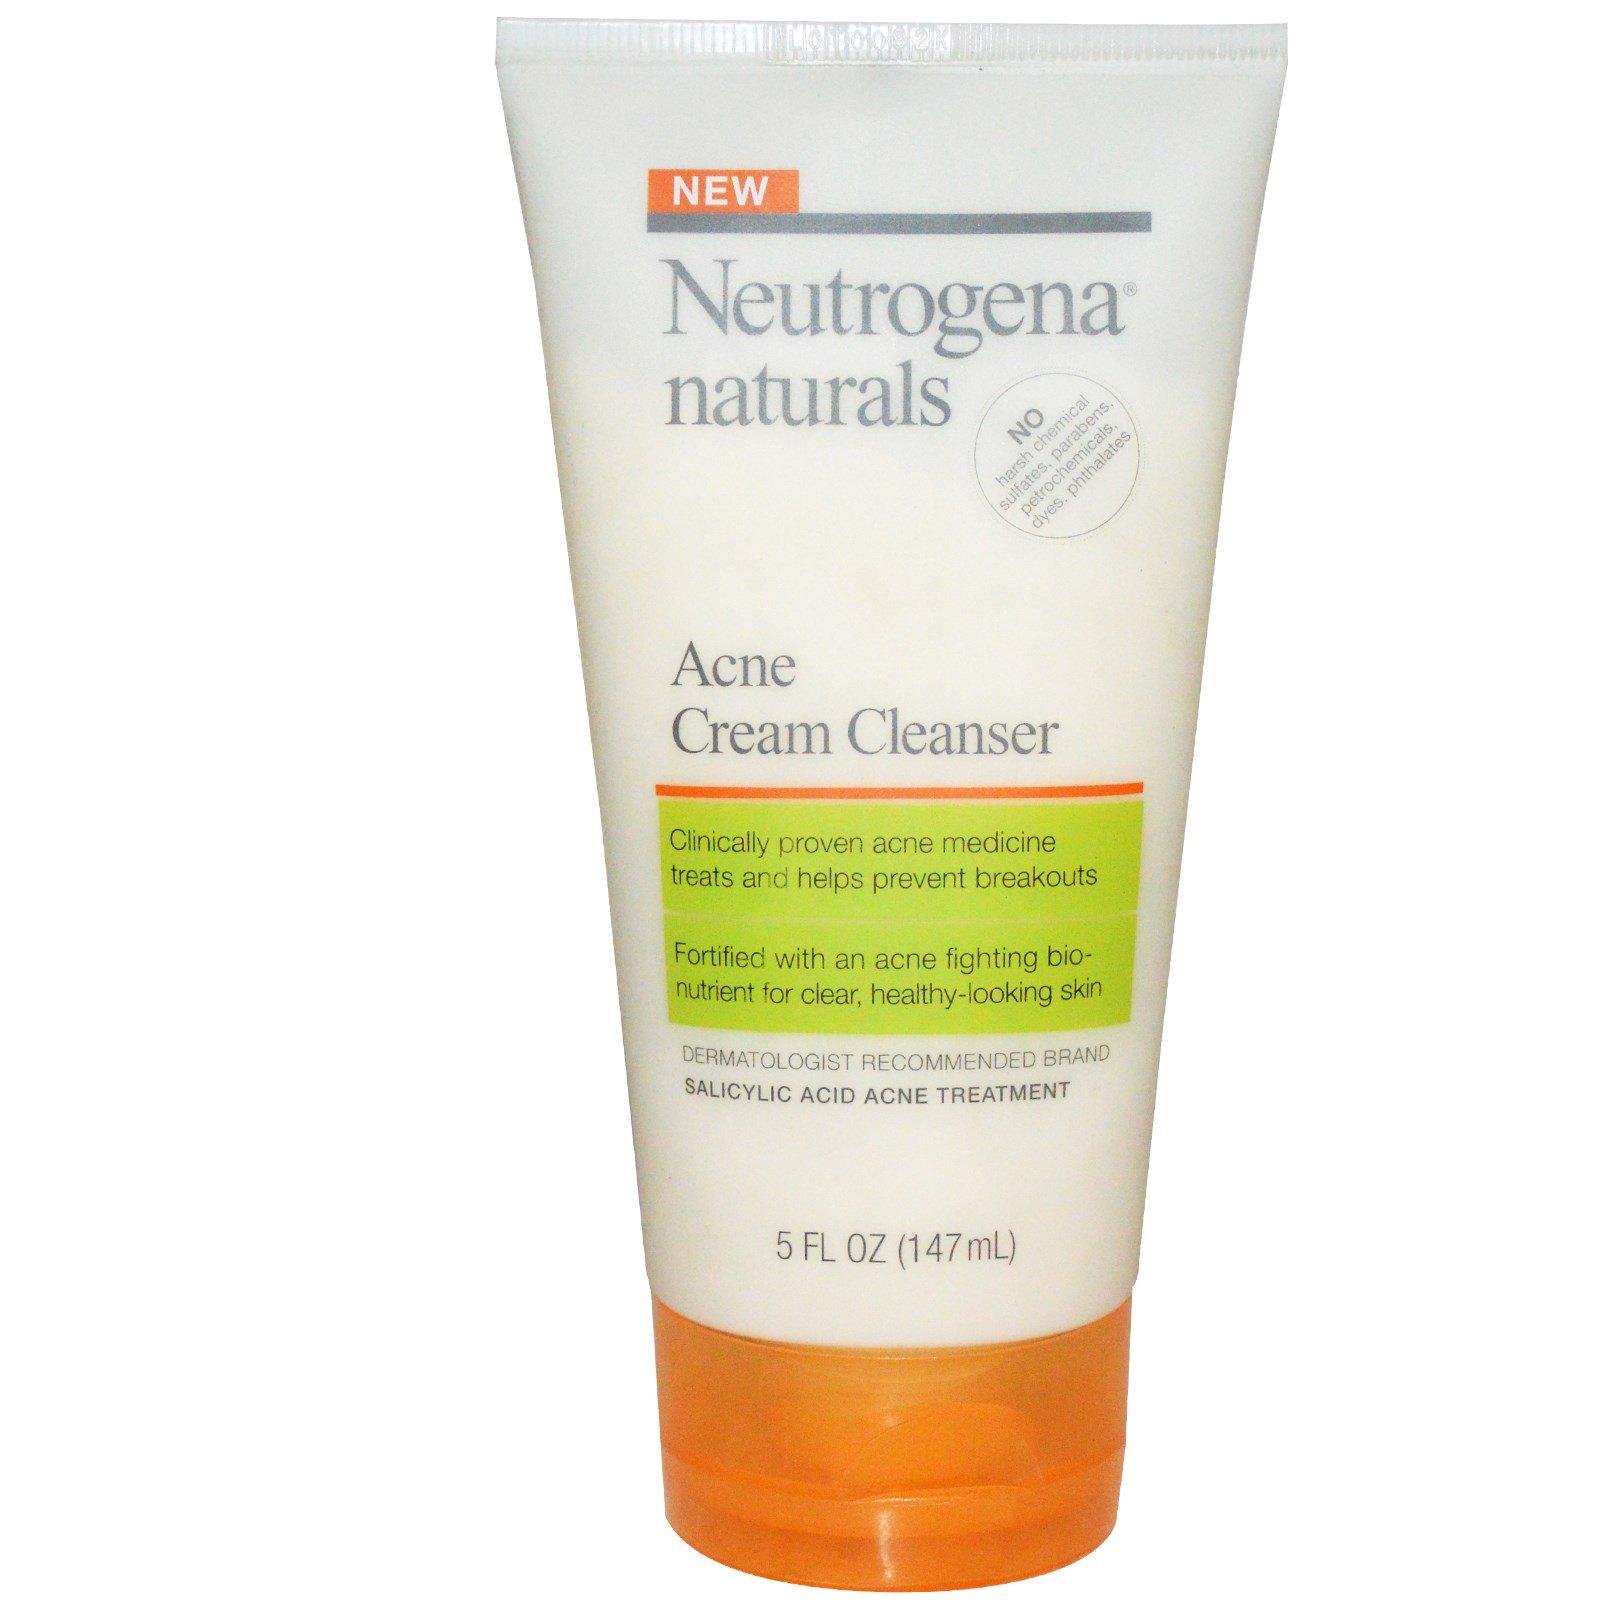 Neutrogena, Очищающий крем от акне, 147 мл (5 жидких унций)